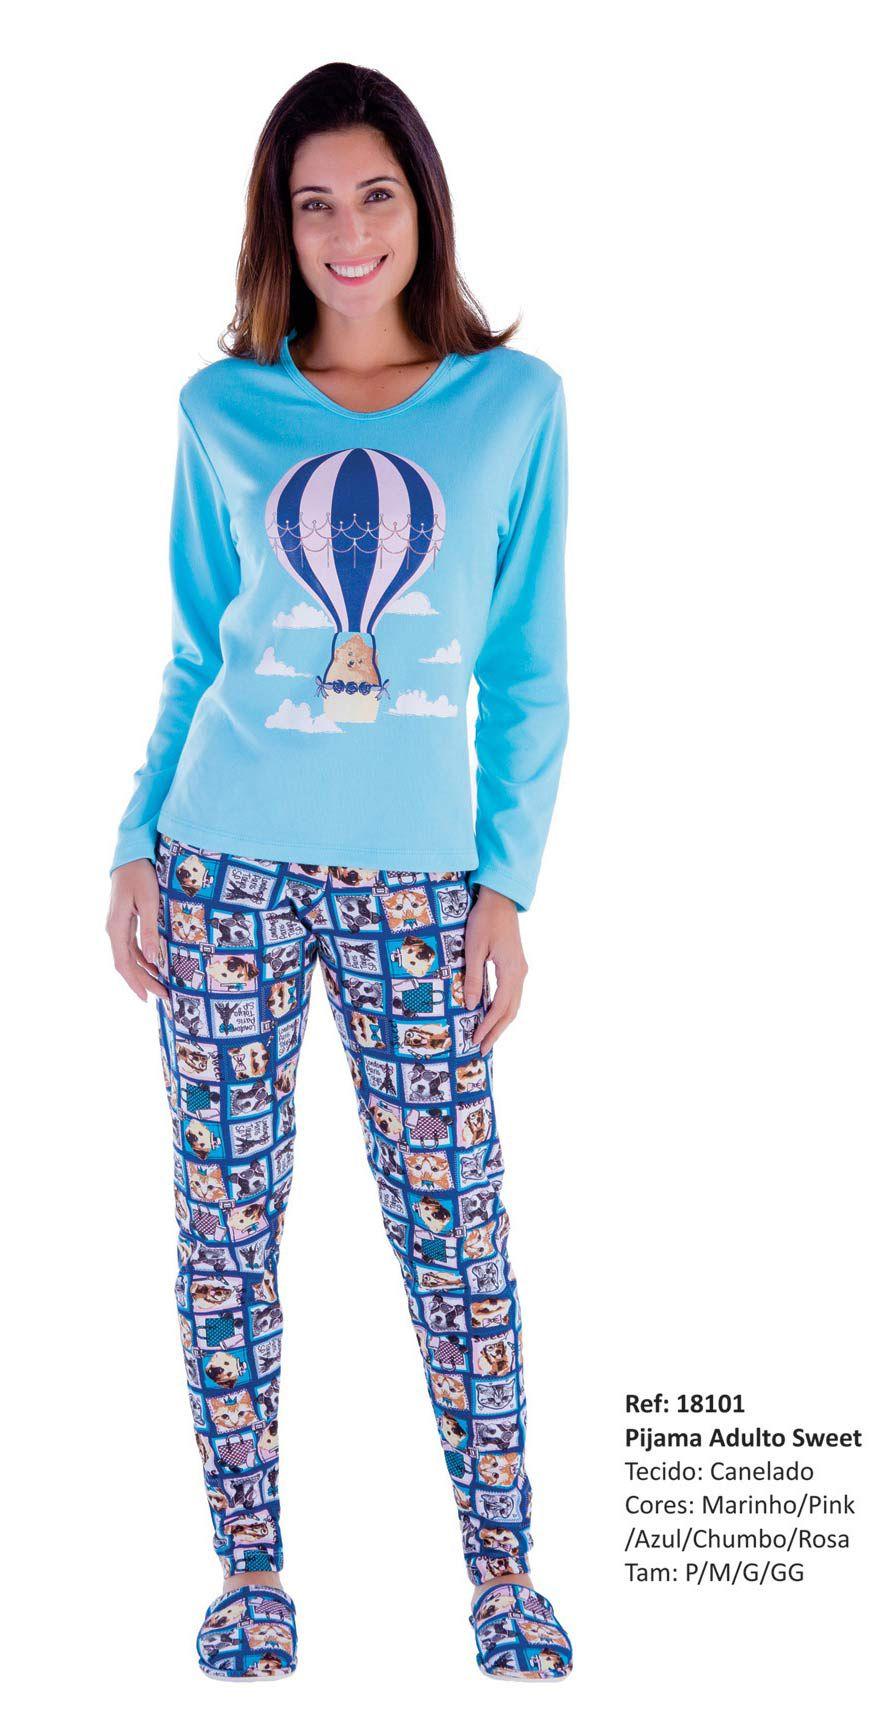 Pijama Feminino Inverno Adulto - Victory 18101